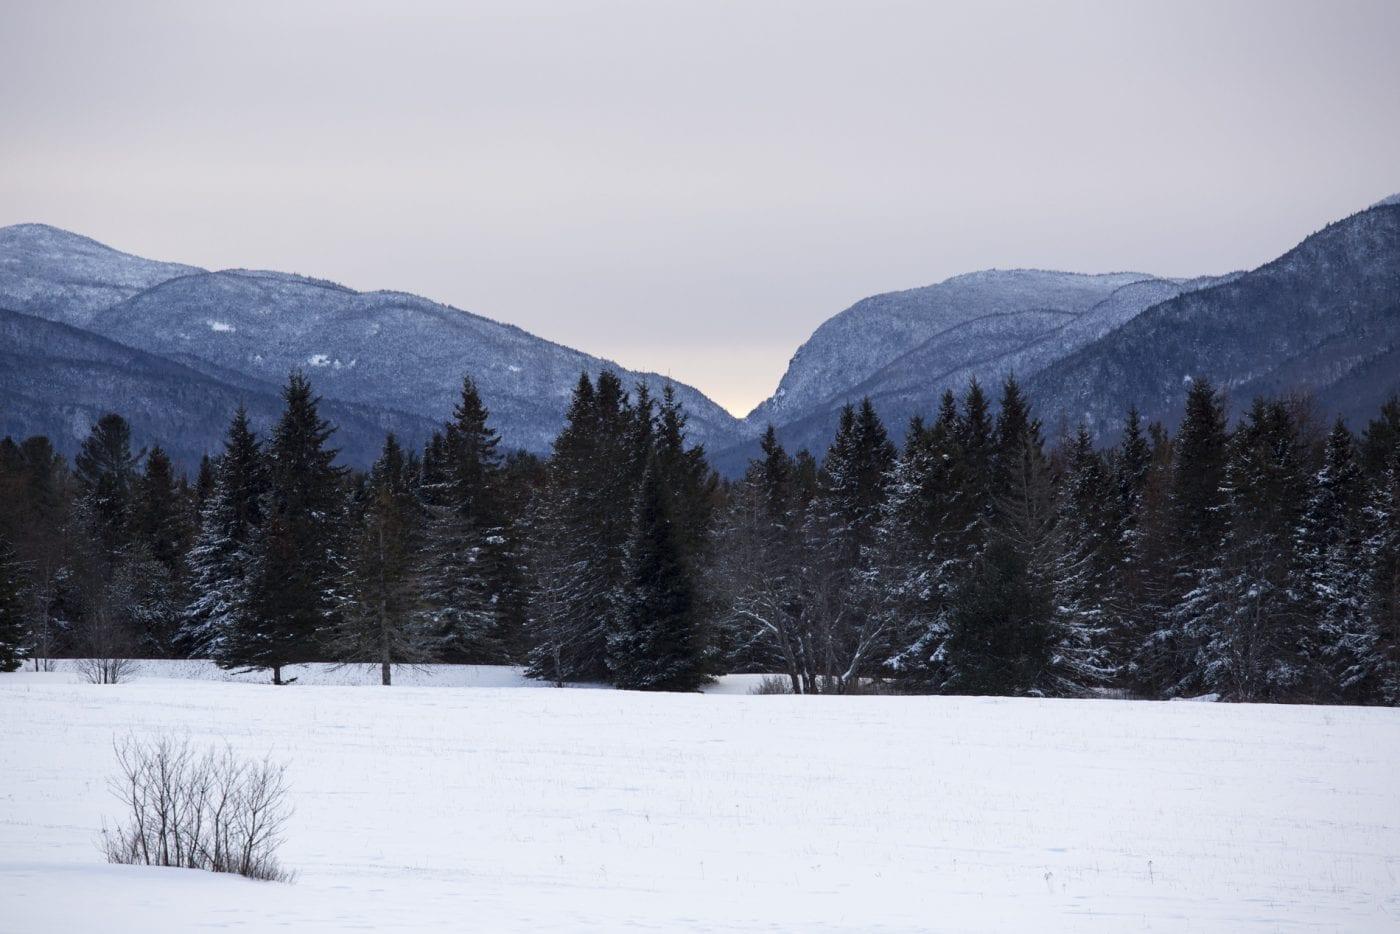 Snowy-Peaks-Adirondacks-Mike-Lynch-8